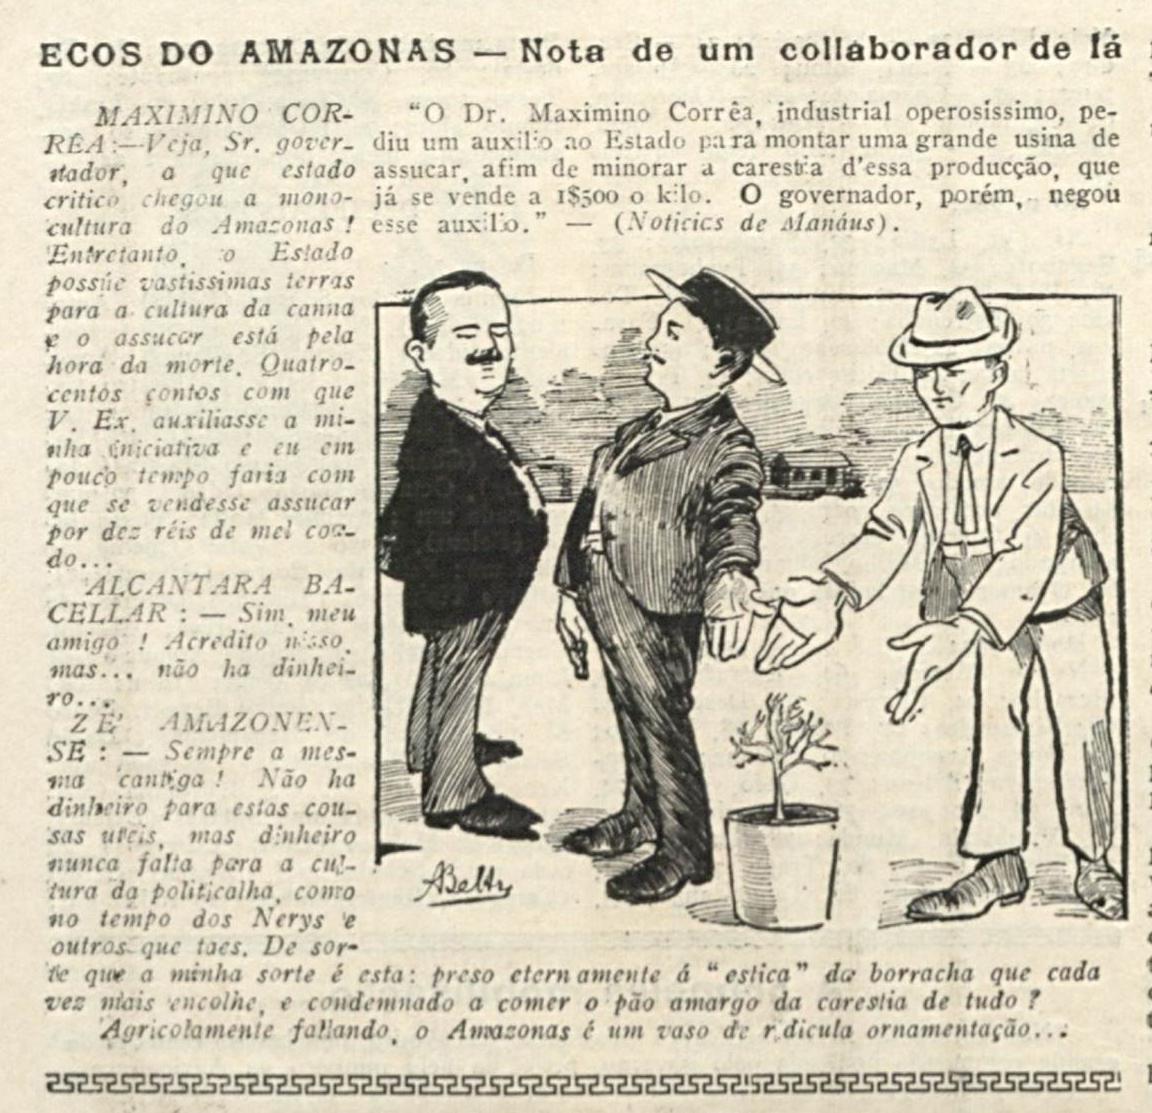 Maximino Corrêa e a indústria de açucar